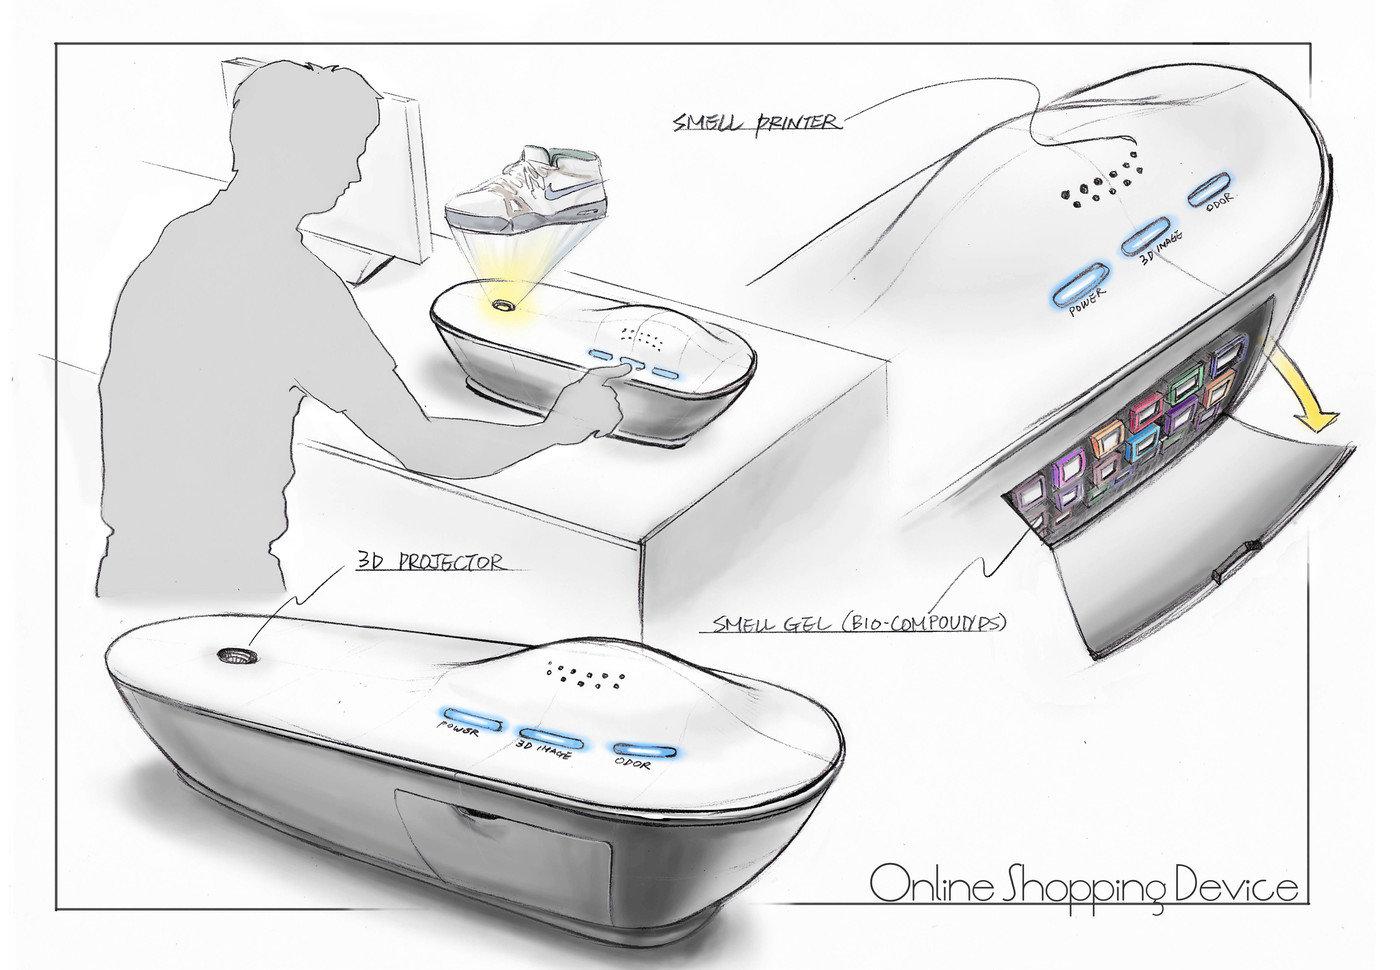 ID Sketches by Jung Ou Yang at Coroflot.com